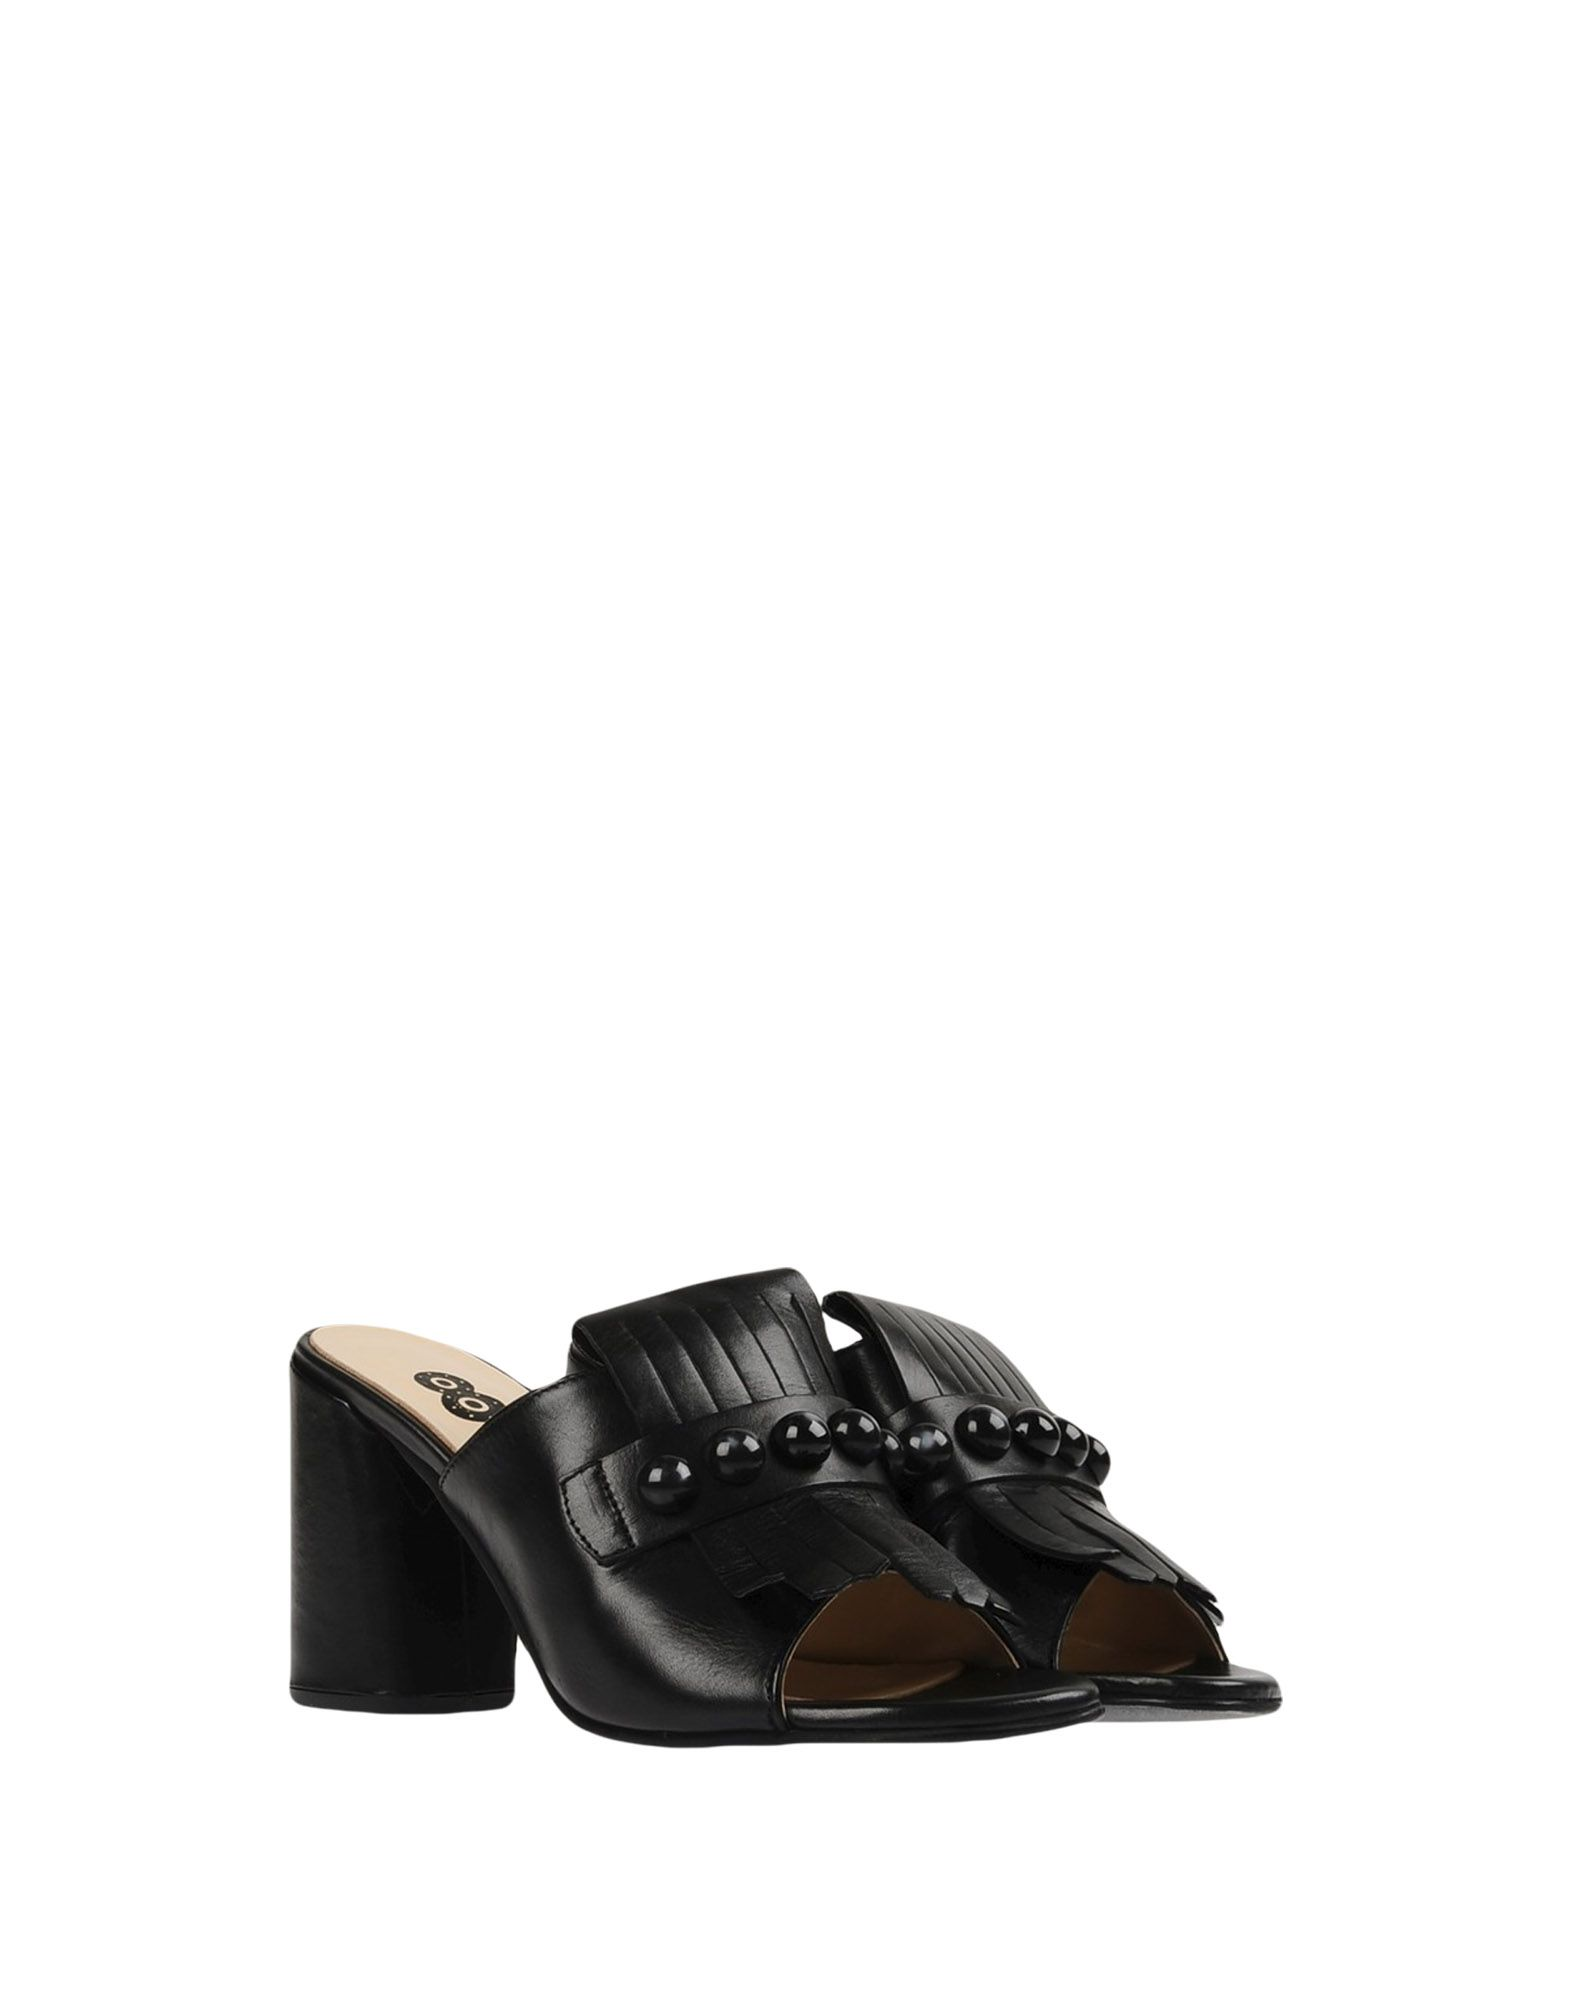 8 Sandalen Damen  beliebte 11452578HM Gute Qualität beliebte  Schuhe 6086c4